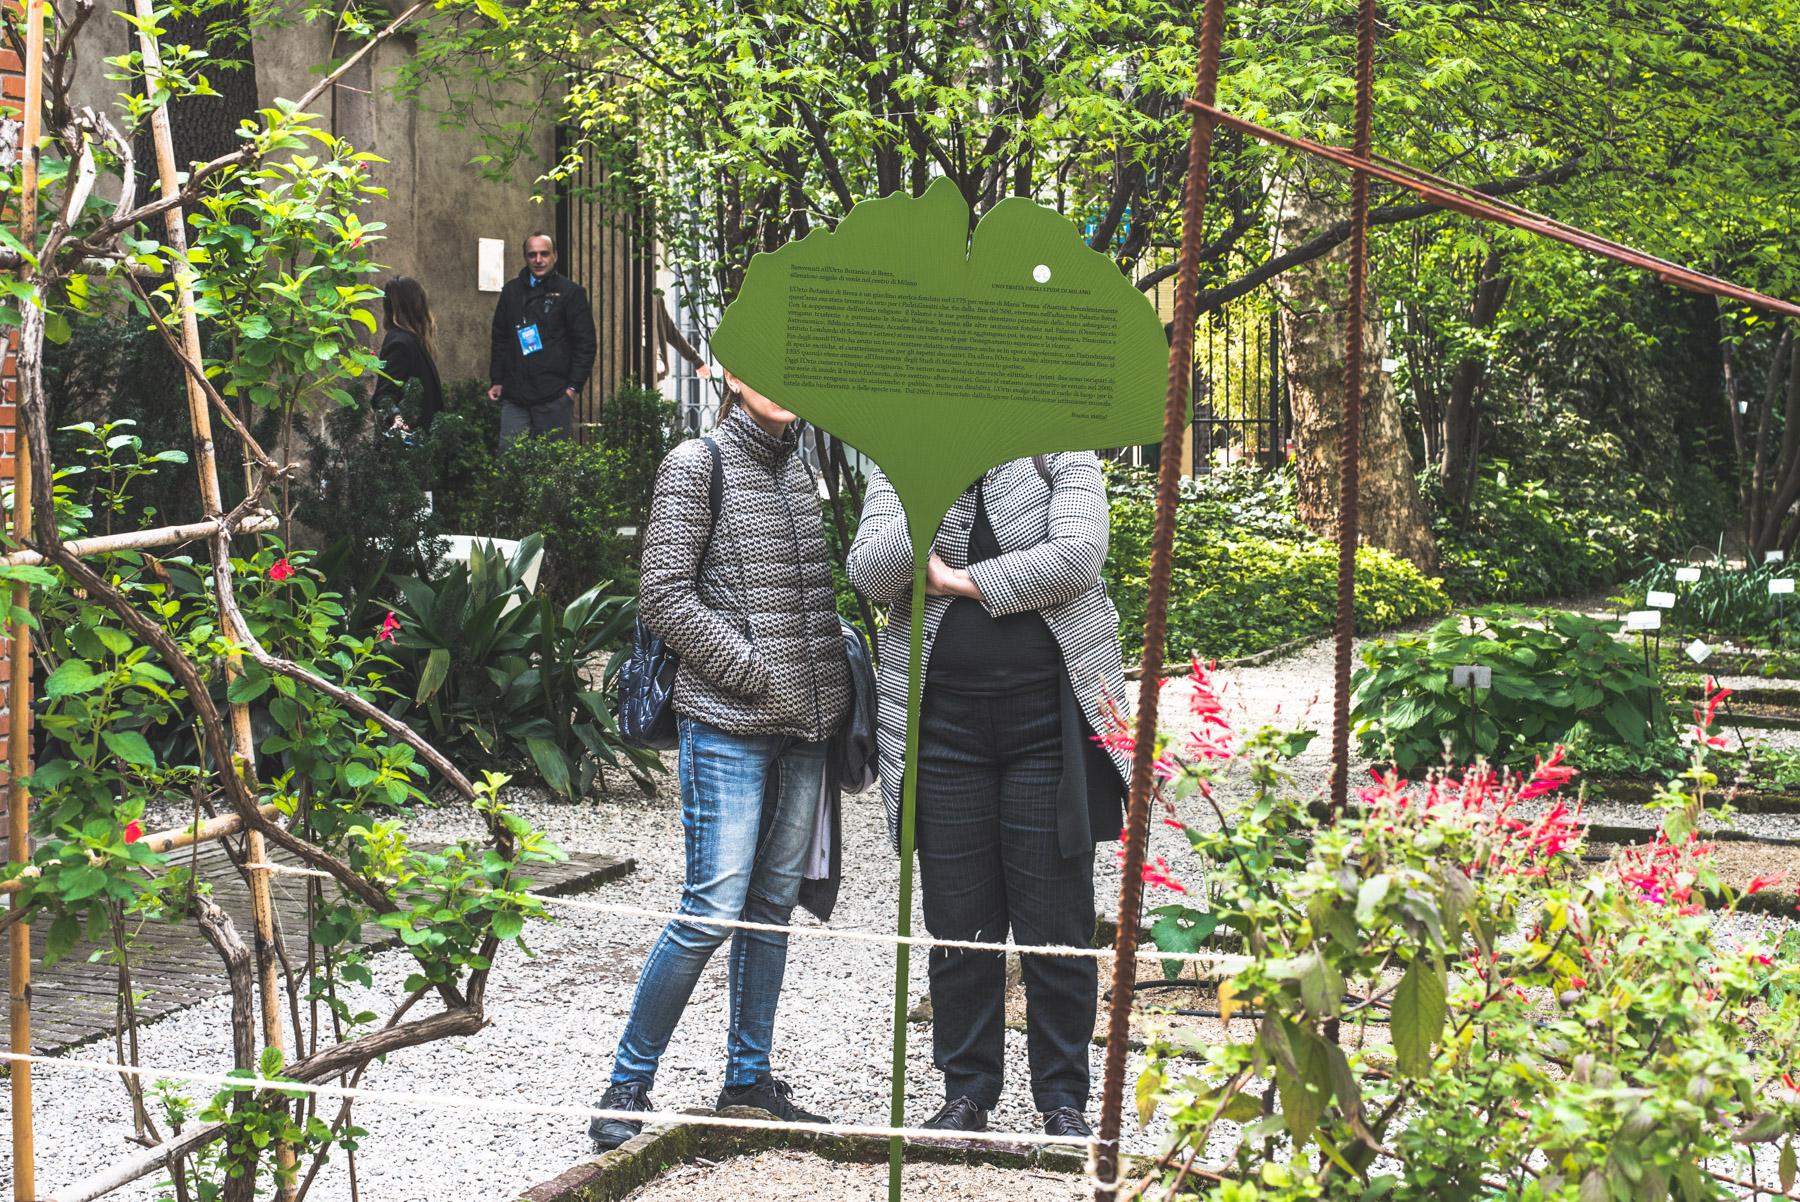 Two women watching a poster in the Brera Botanical Gardens during Fuorisalone Milan Design Week 2019